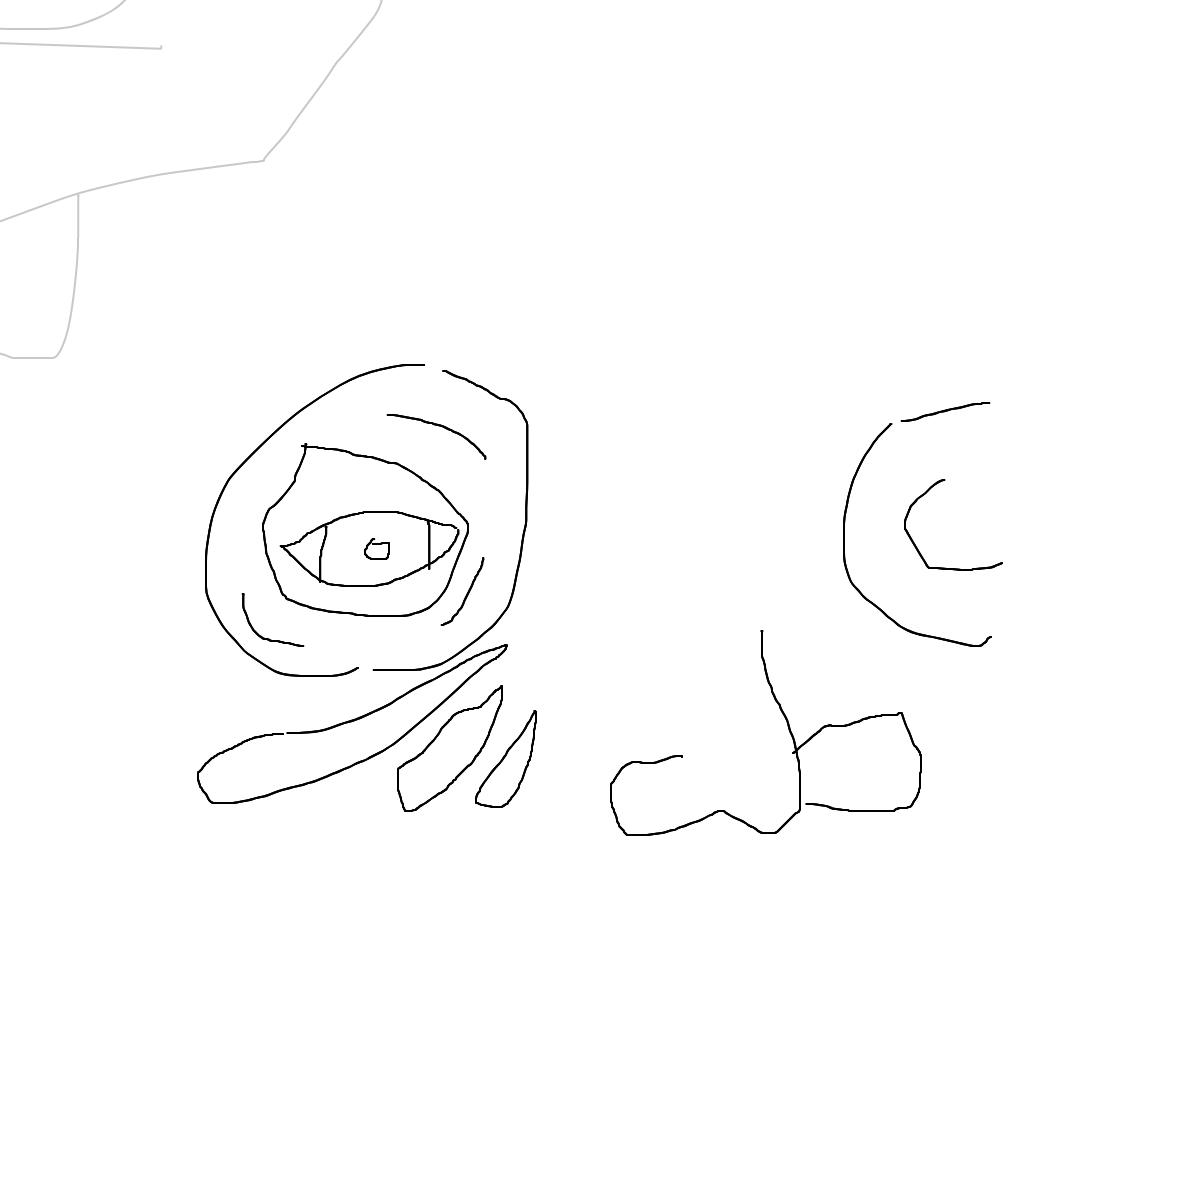 BAAAM drawing#24173 lat:46.5207901000976560lng: 6.6338953971862790